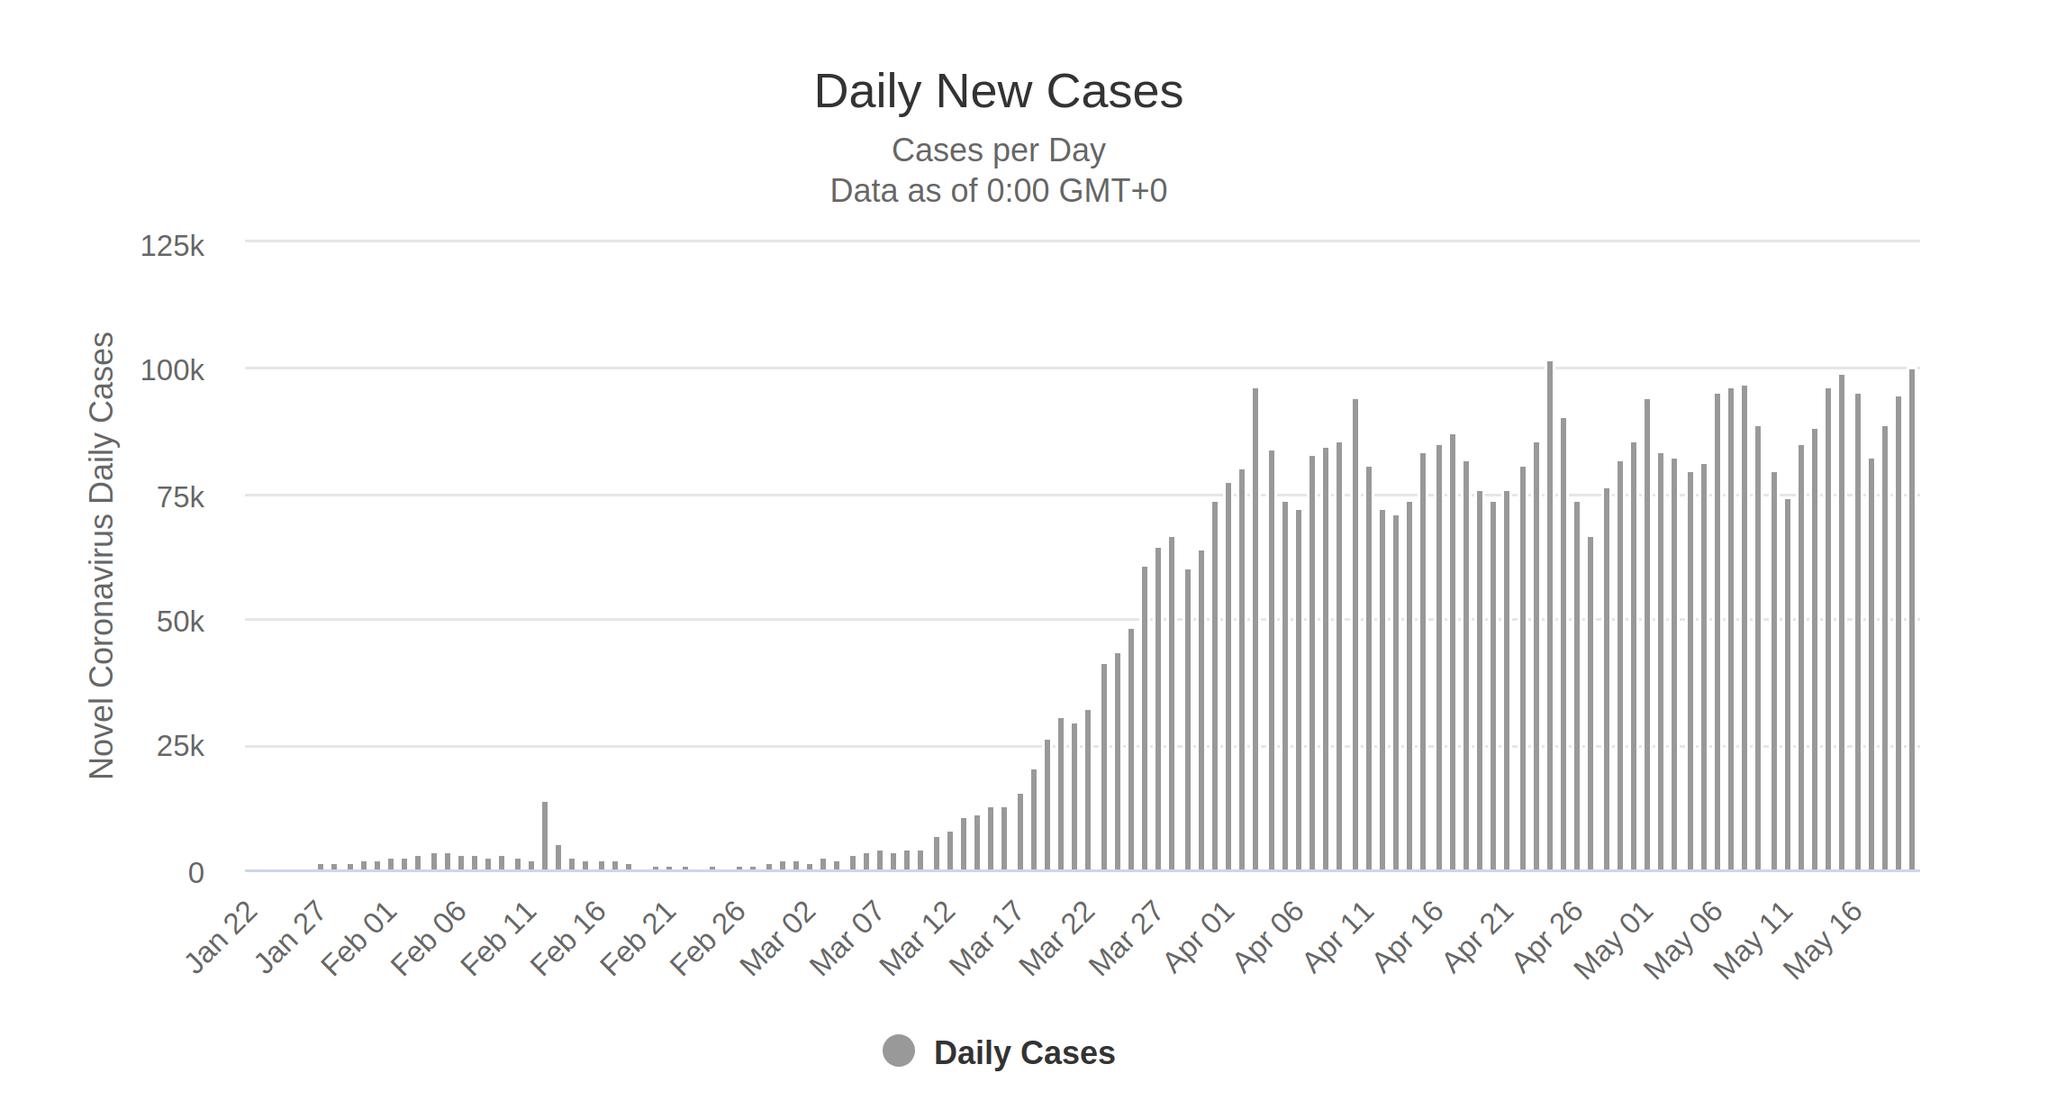 "tuzzi on Twitter: ""好久沒有關心台灣以外的疫情。有時真的會有「武漢病毒是不是已經失去毒性了」這樣的錯覺。  沒有。全世界目前感染數剛過500萬例(美國150萬)。  比較奇特的是,全世界每日新增人數從4月初開始,一直規律地在每天7萬到10萬之間波動,如此已經一個多月 ..."